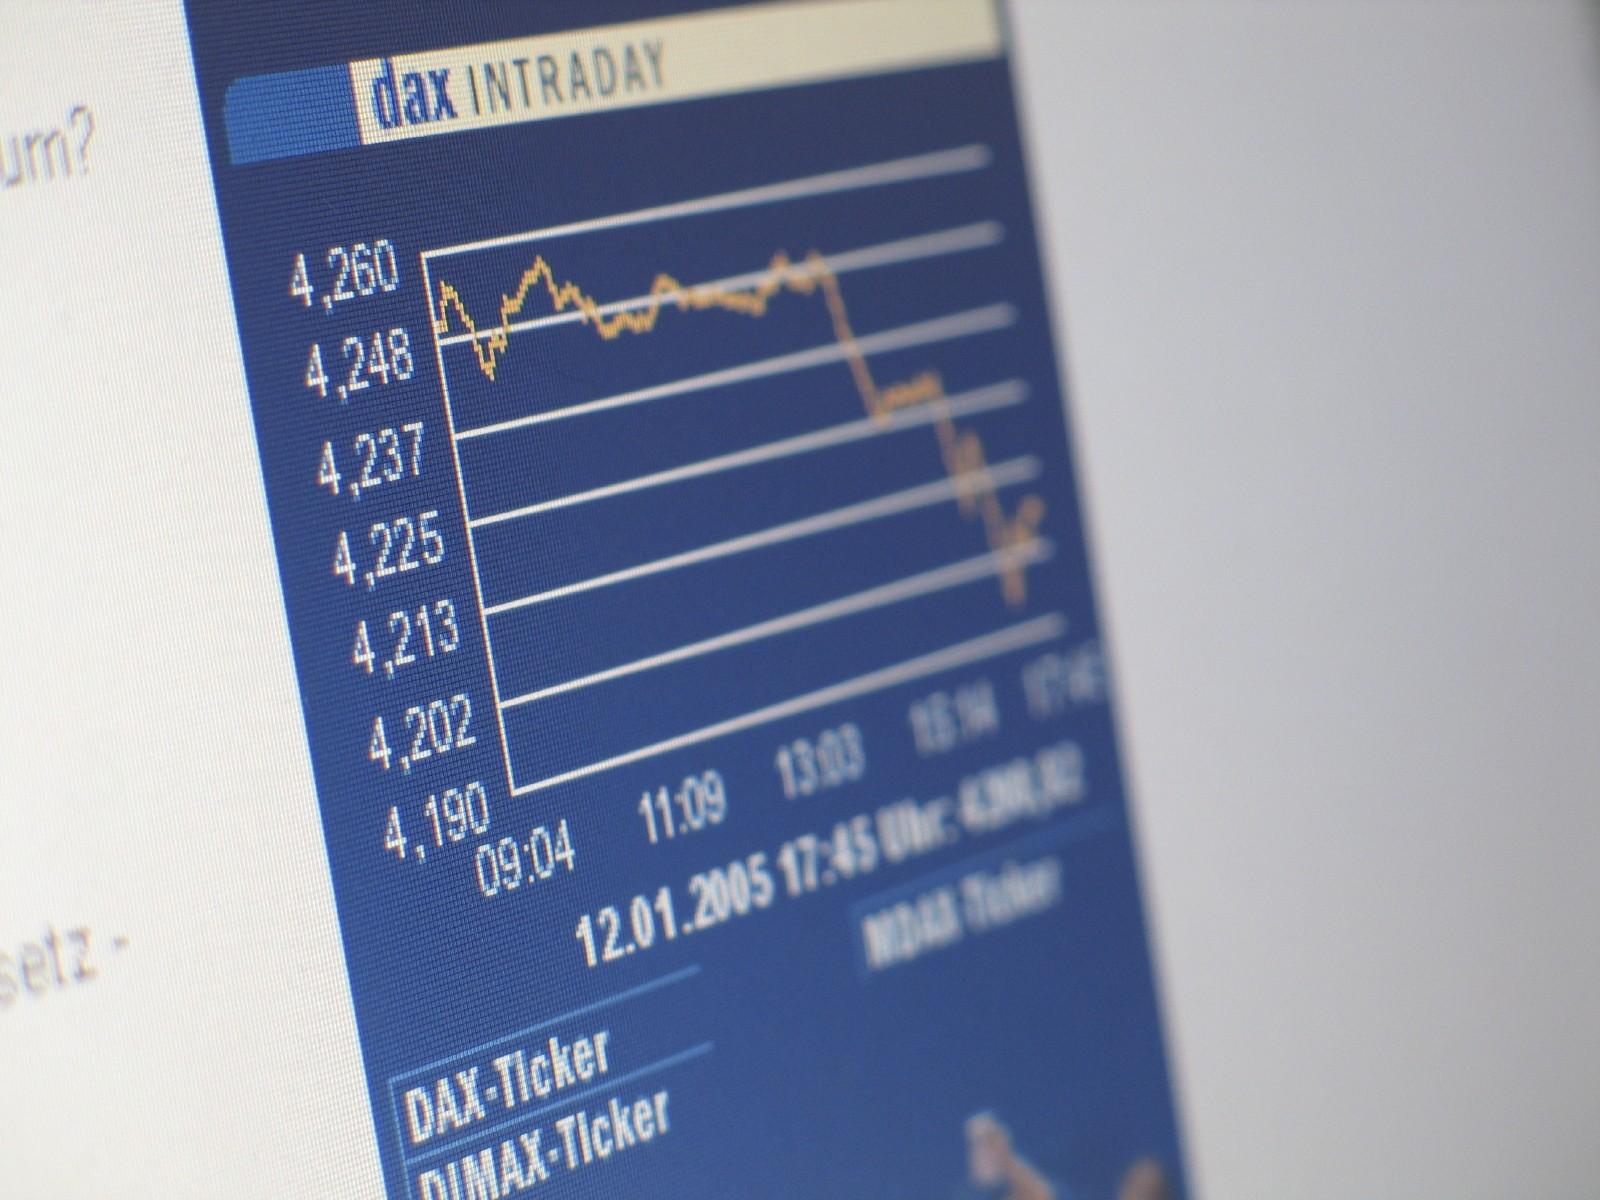 dax stock chart